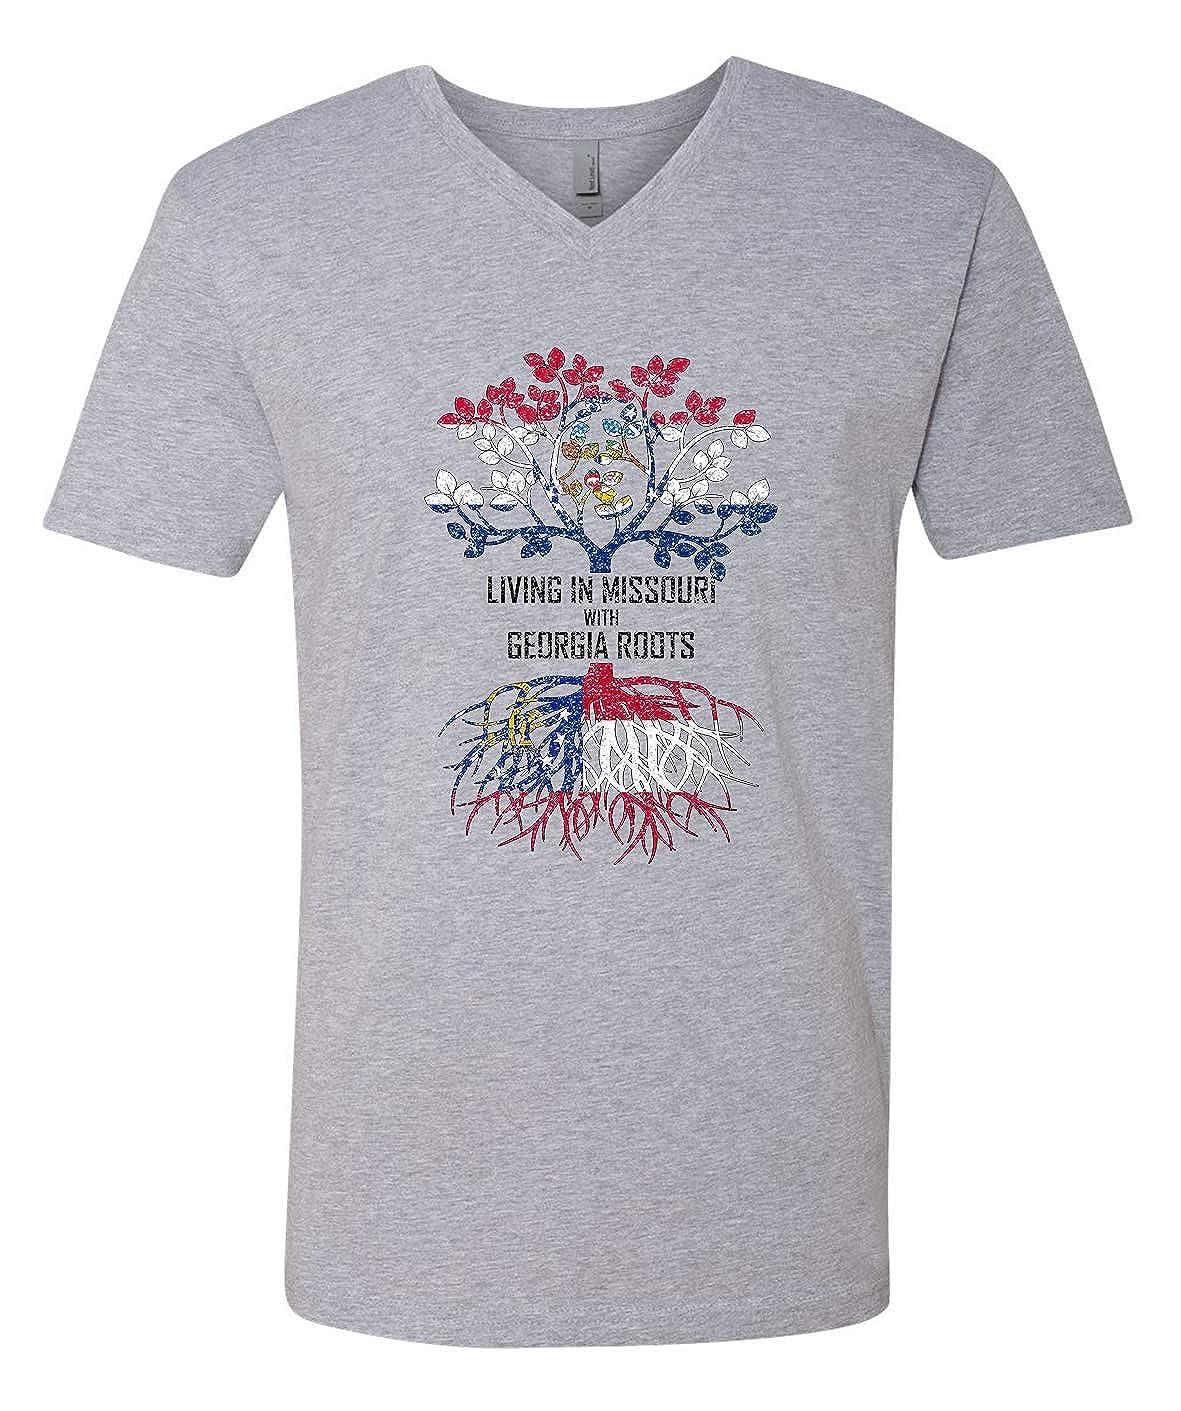 Tenacitee Mens Living in Missouri Georgia Roots T-Shirt